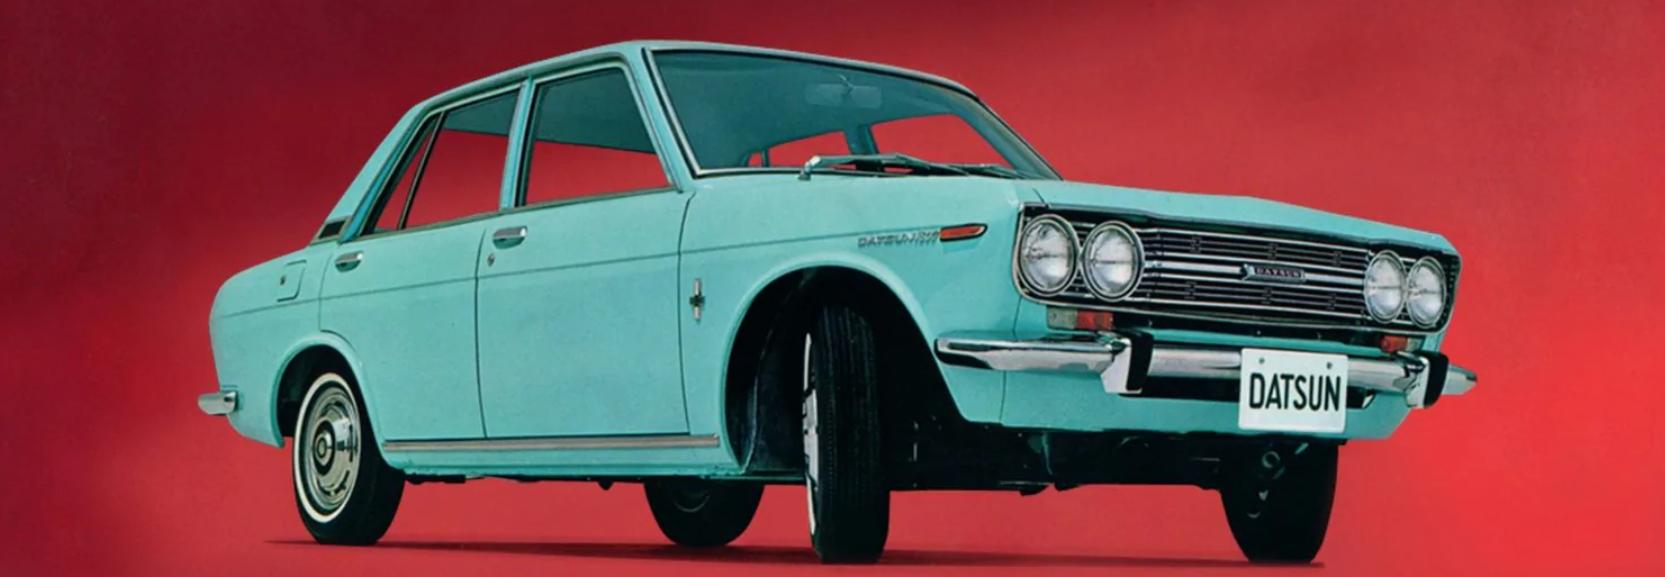 Classic Nissan Datsun | Nissan History